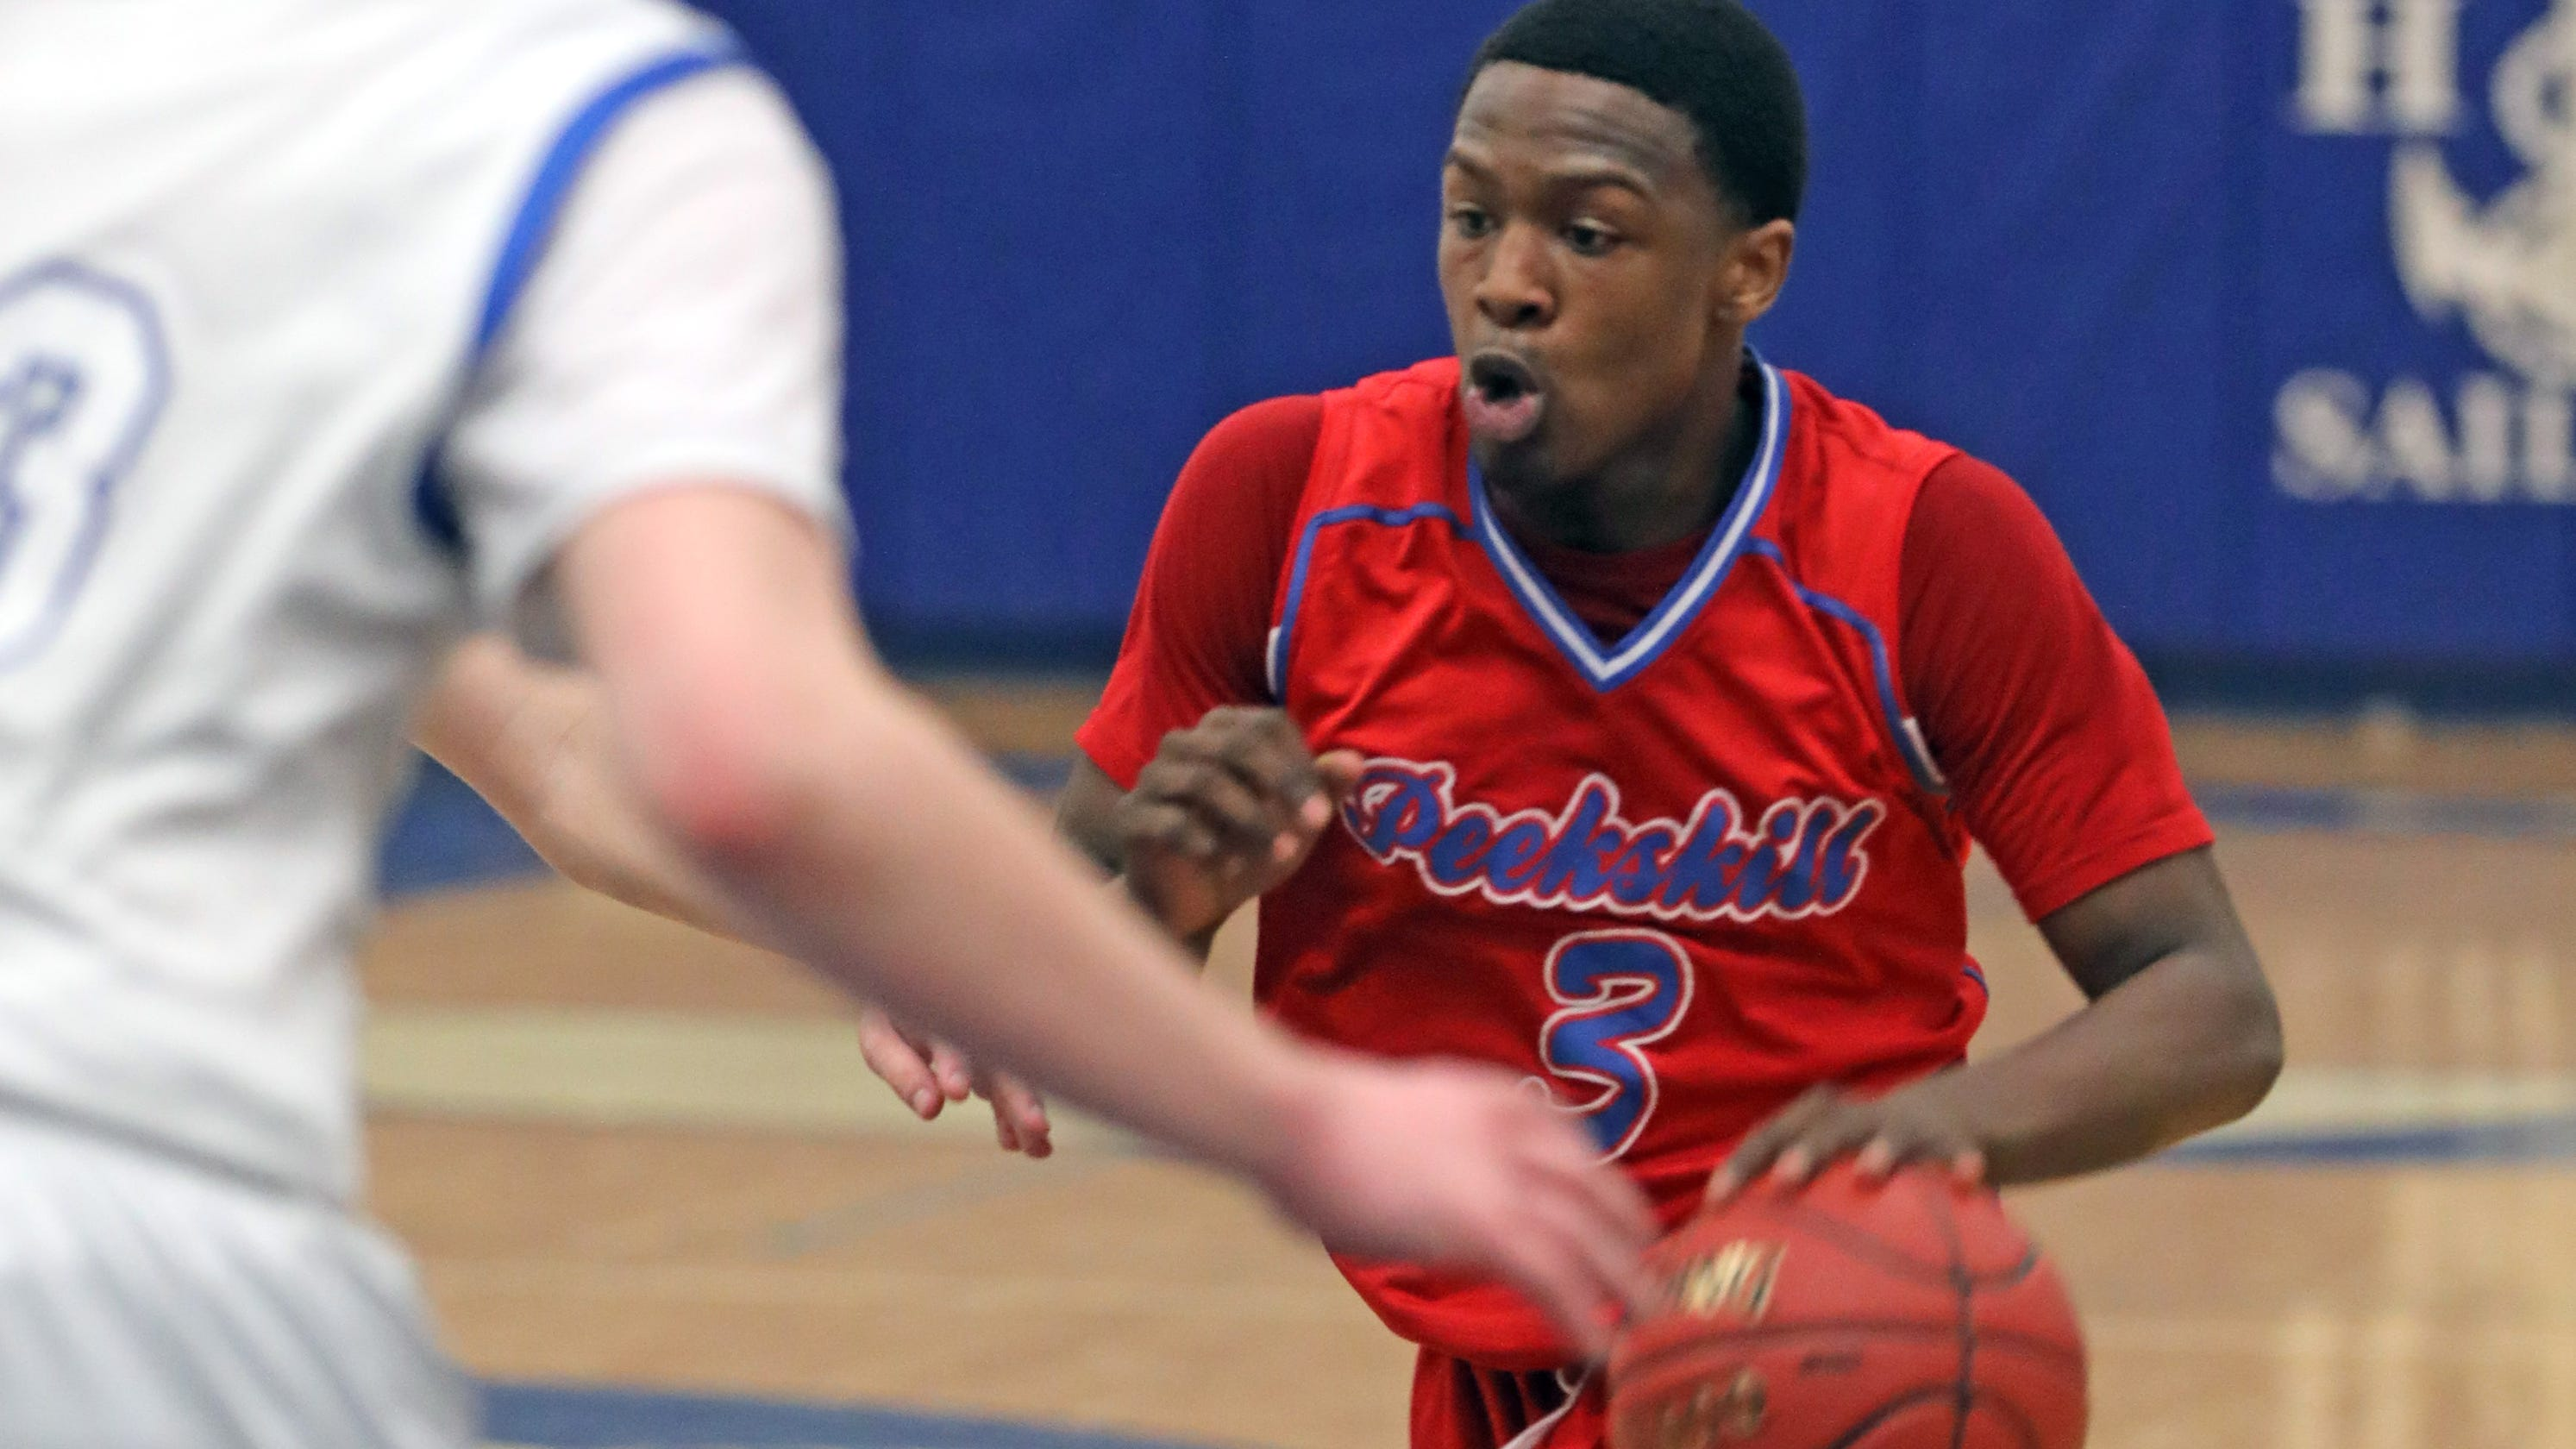 ac2ba2aeb6f11 Coaches rave about Peekskill basketball star Shion Darby